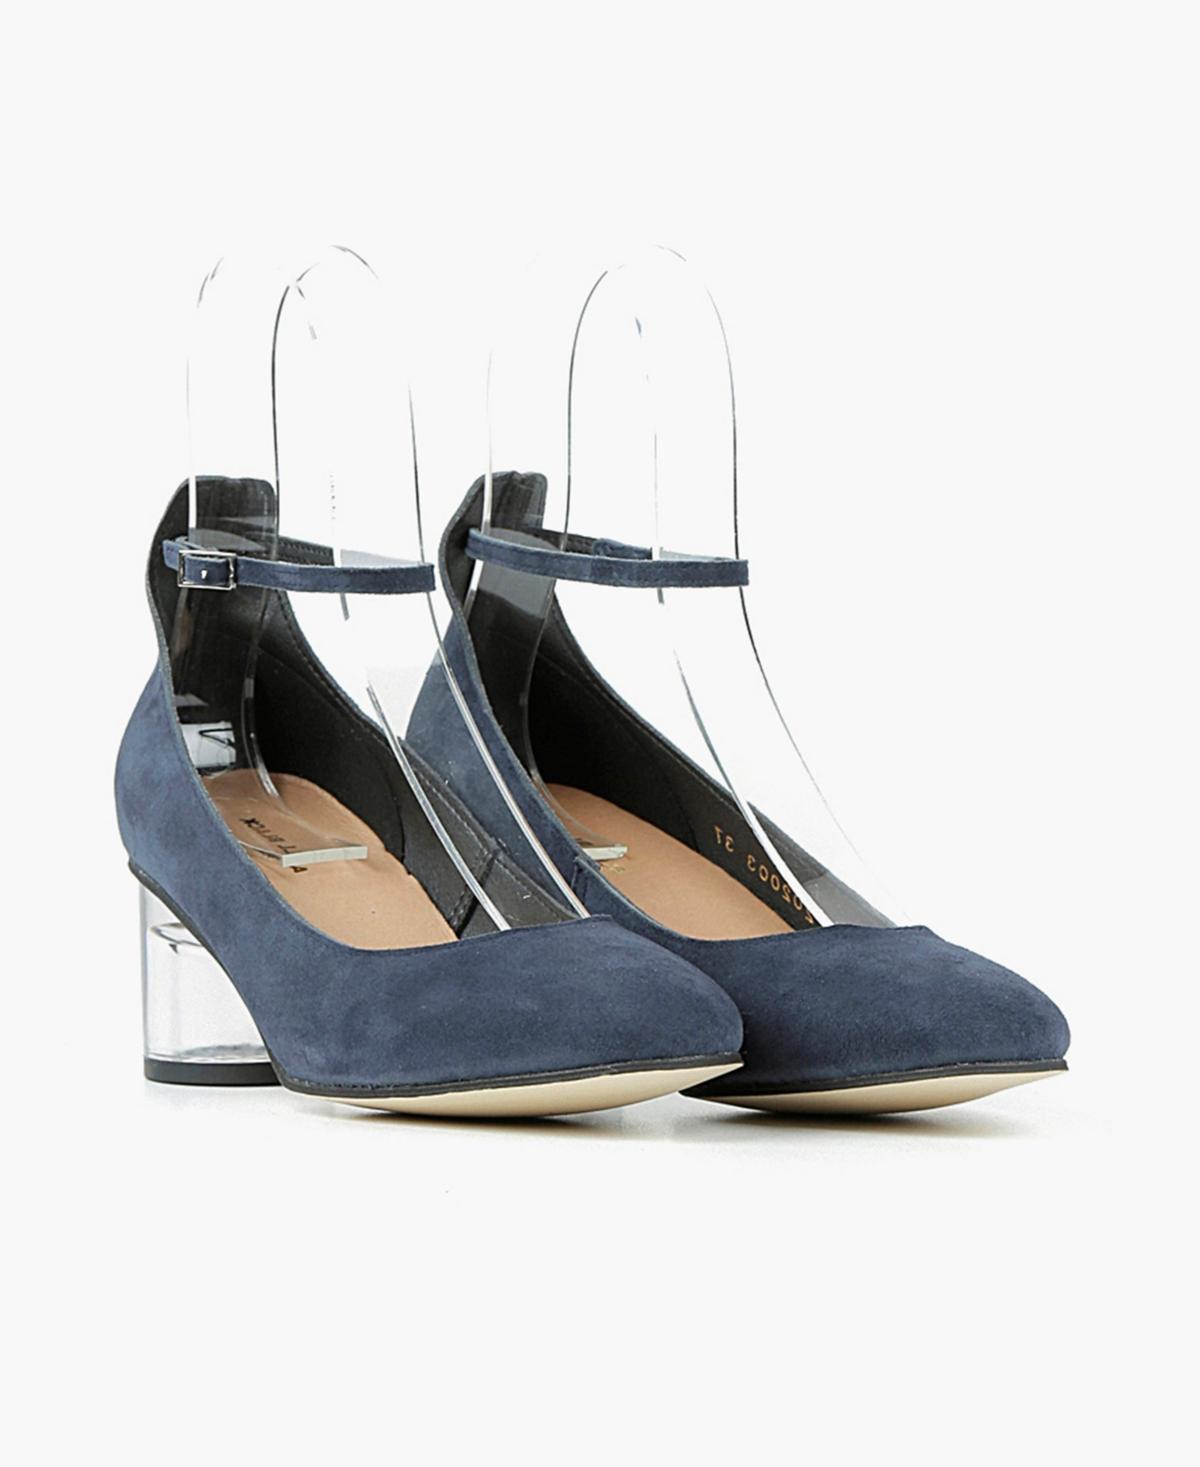 All Black Women's Classy Cylinder Lucite Heel Pumps Women's Shoes